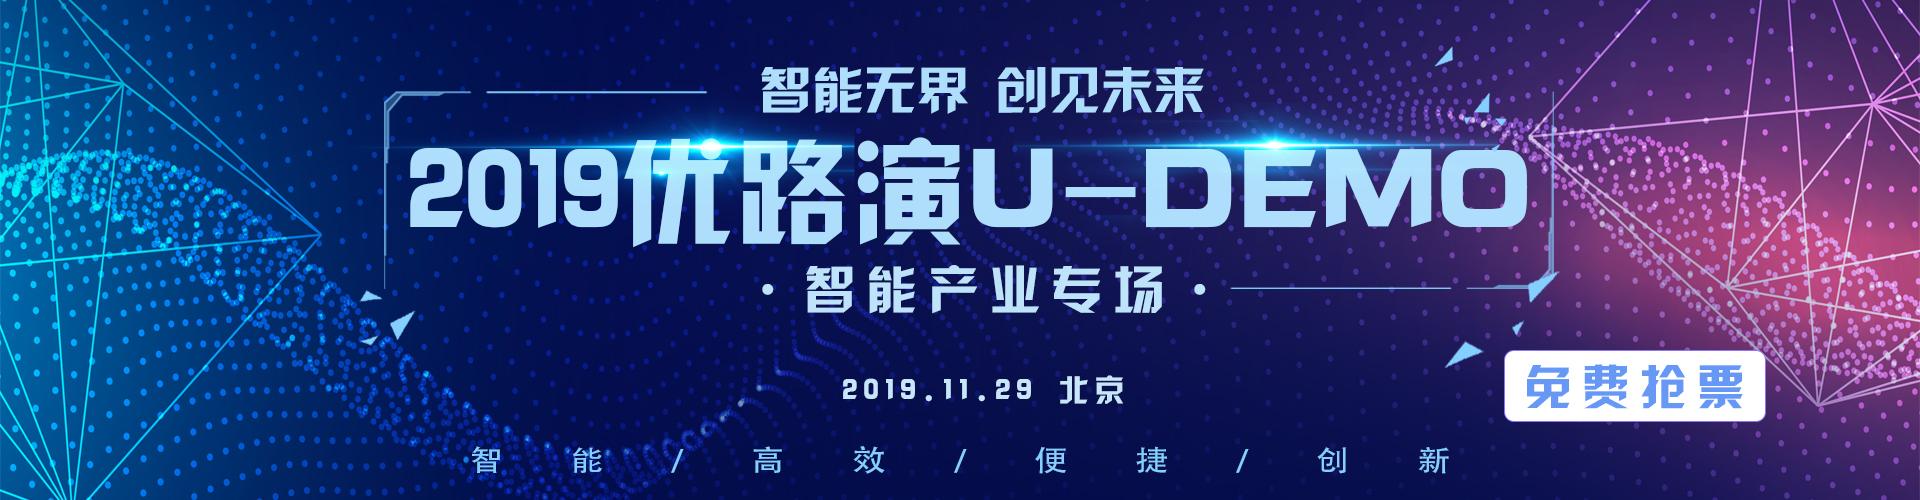 【11.29】优投主办|2019优路演UDEMO-智能产业专场